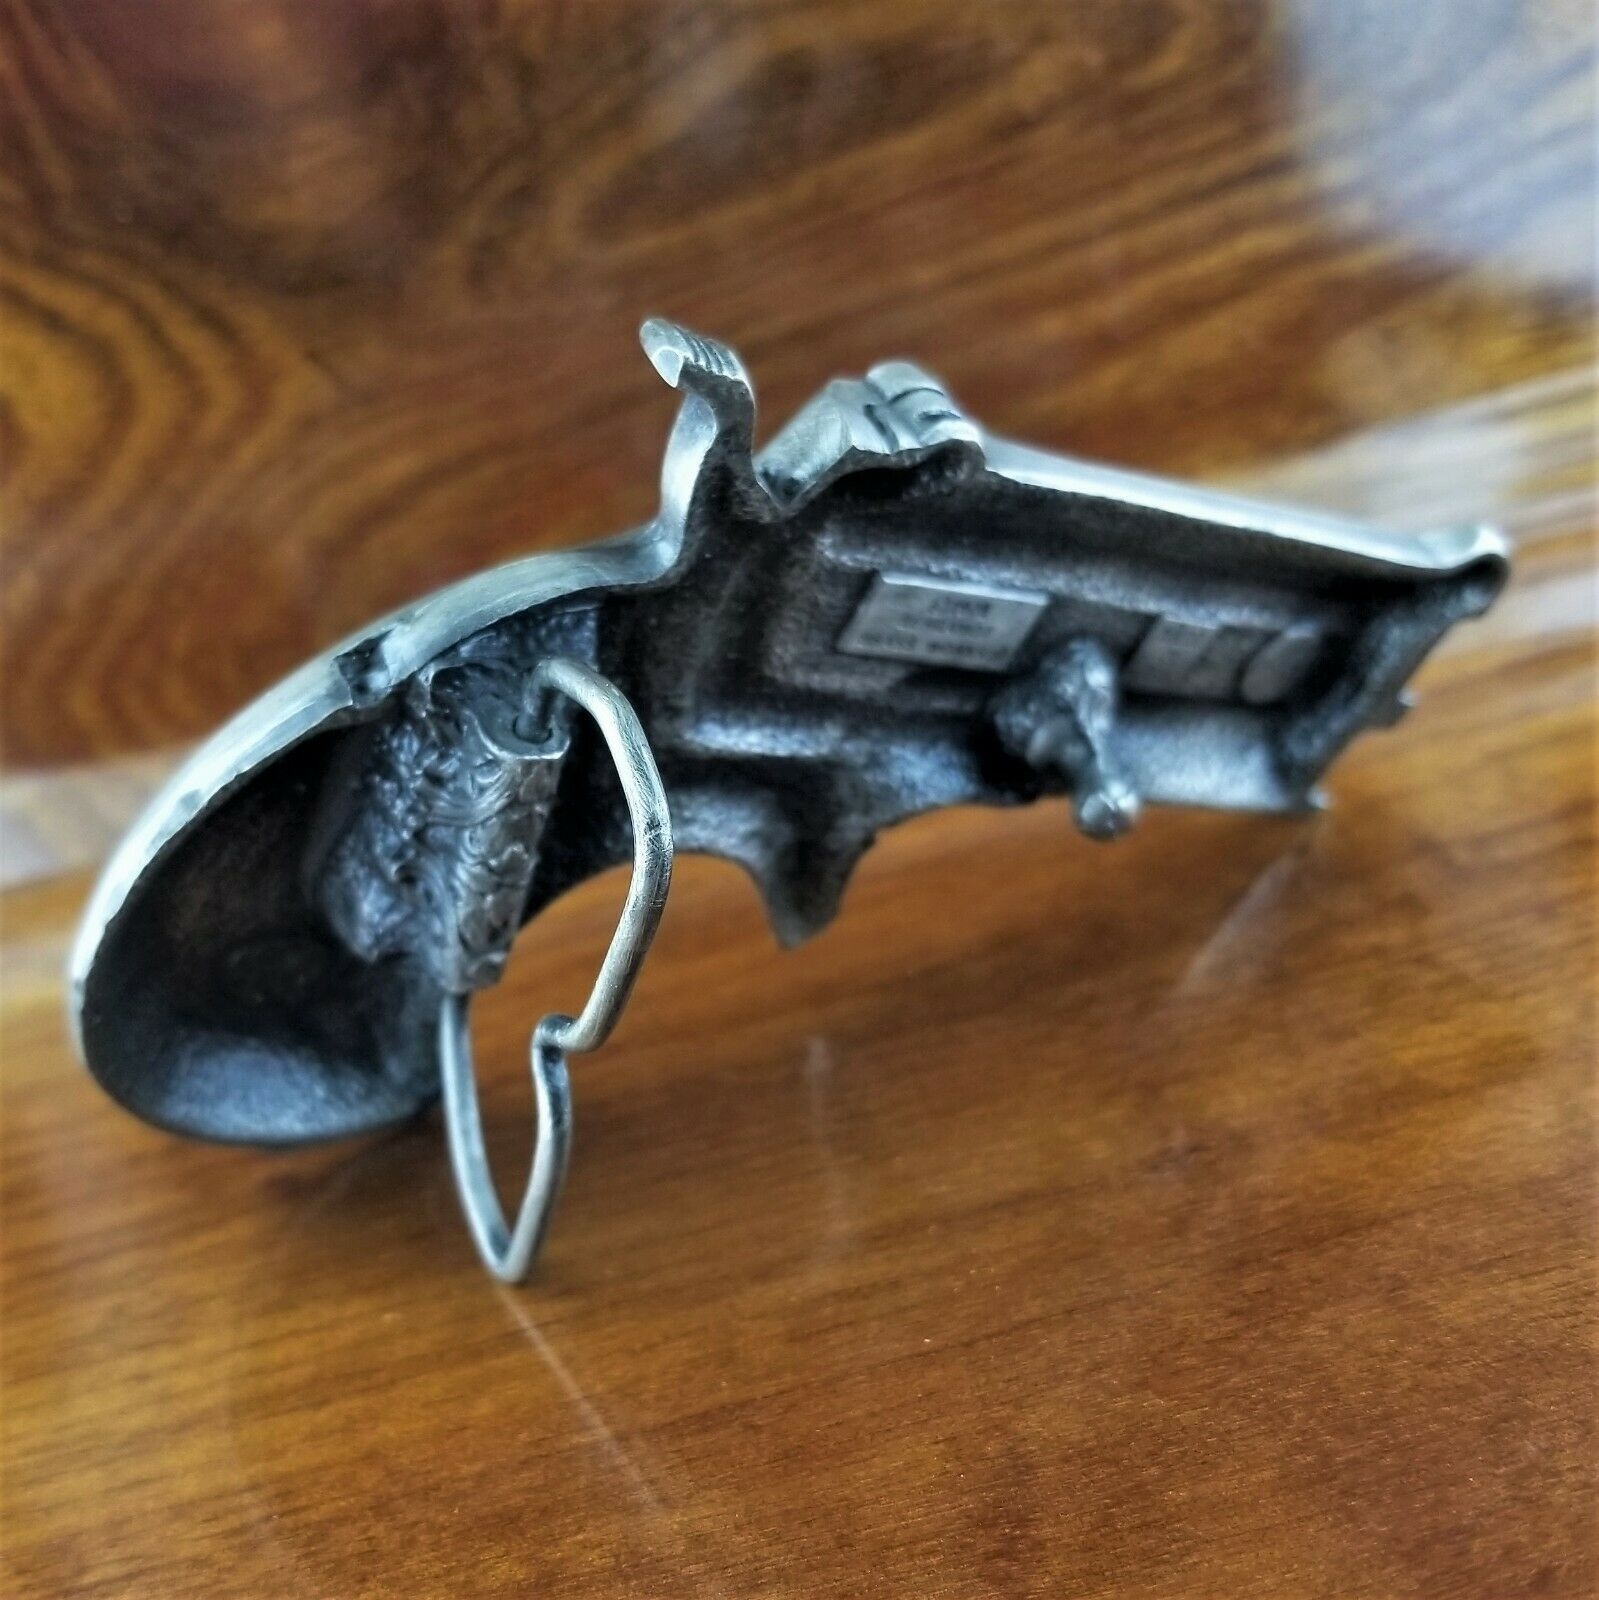 Vintage 1978 Bergamot Brass Works F-156 Derringer Hand Gun Pistol Belt Buckle image 3